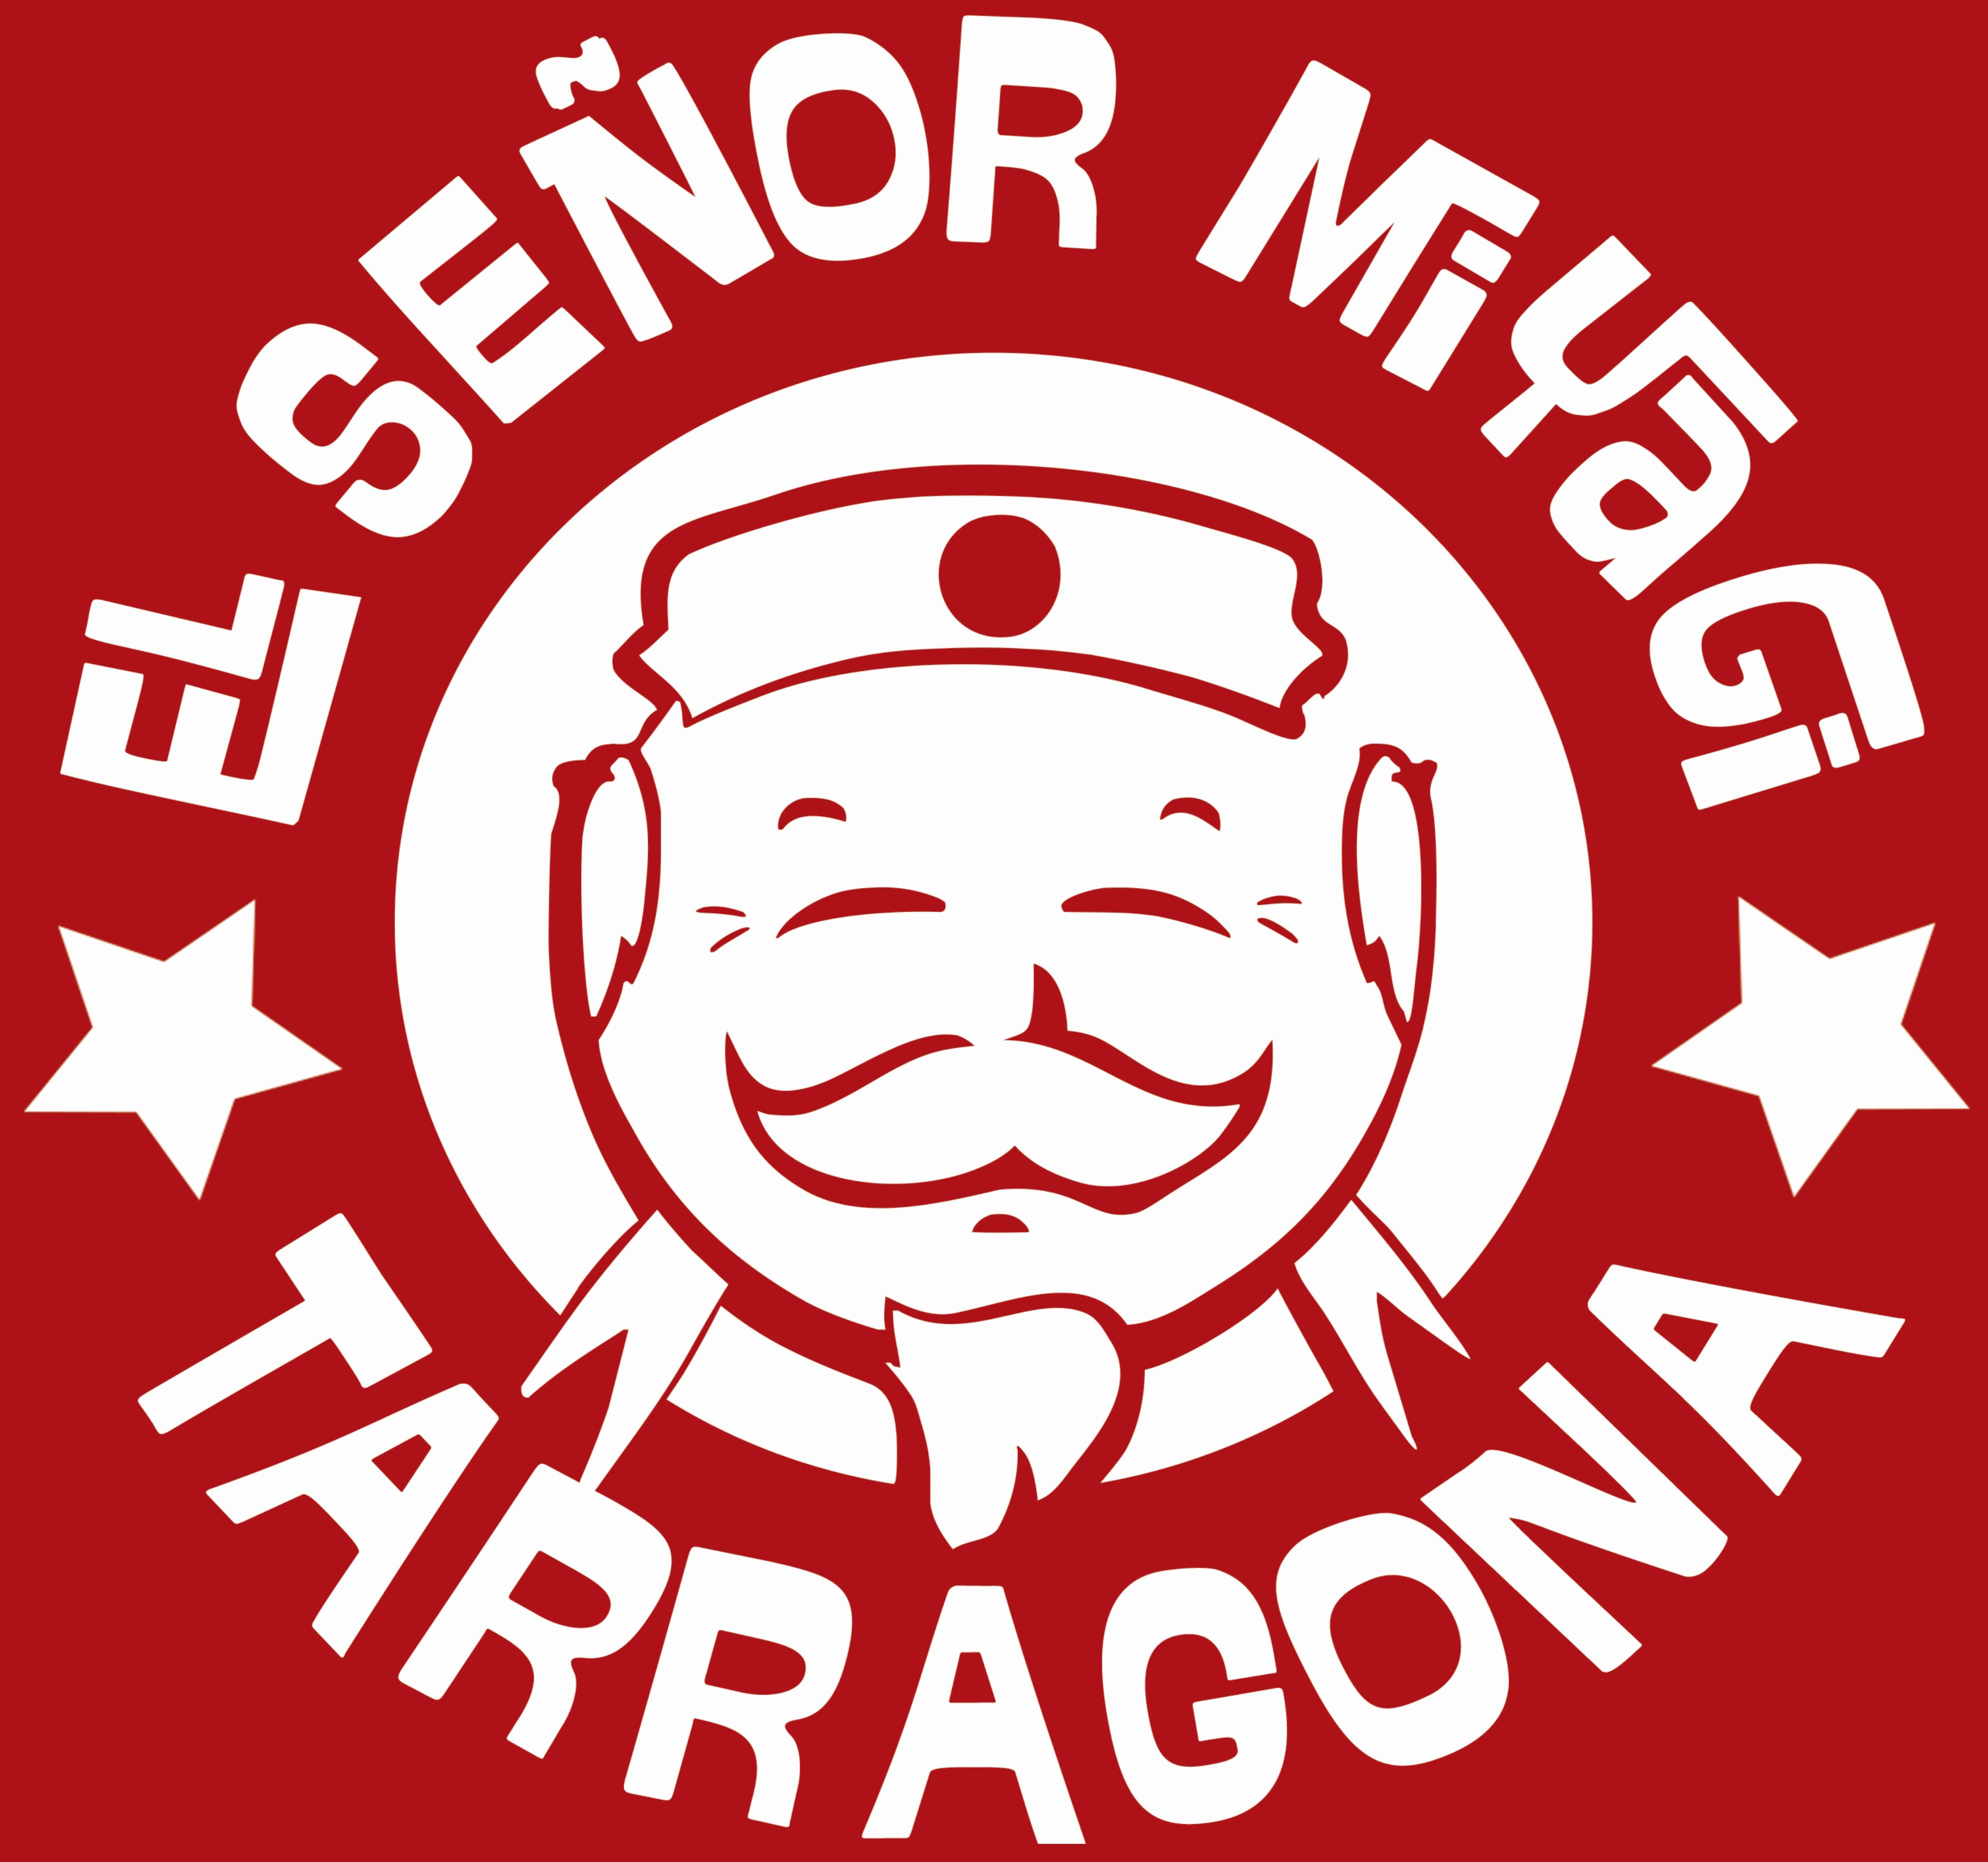 El Señor Miyagi Tarragona